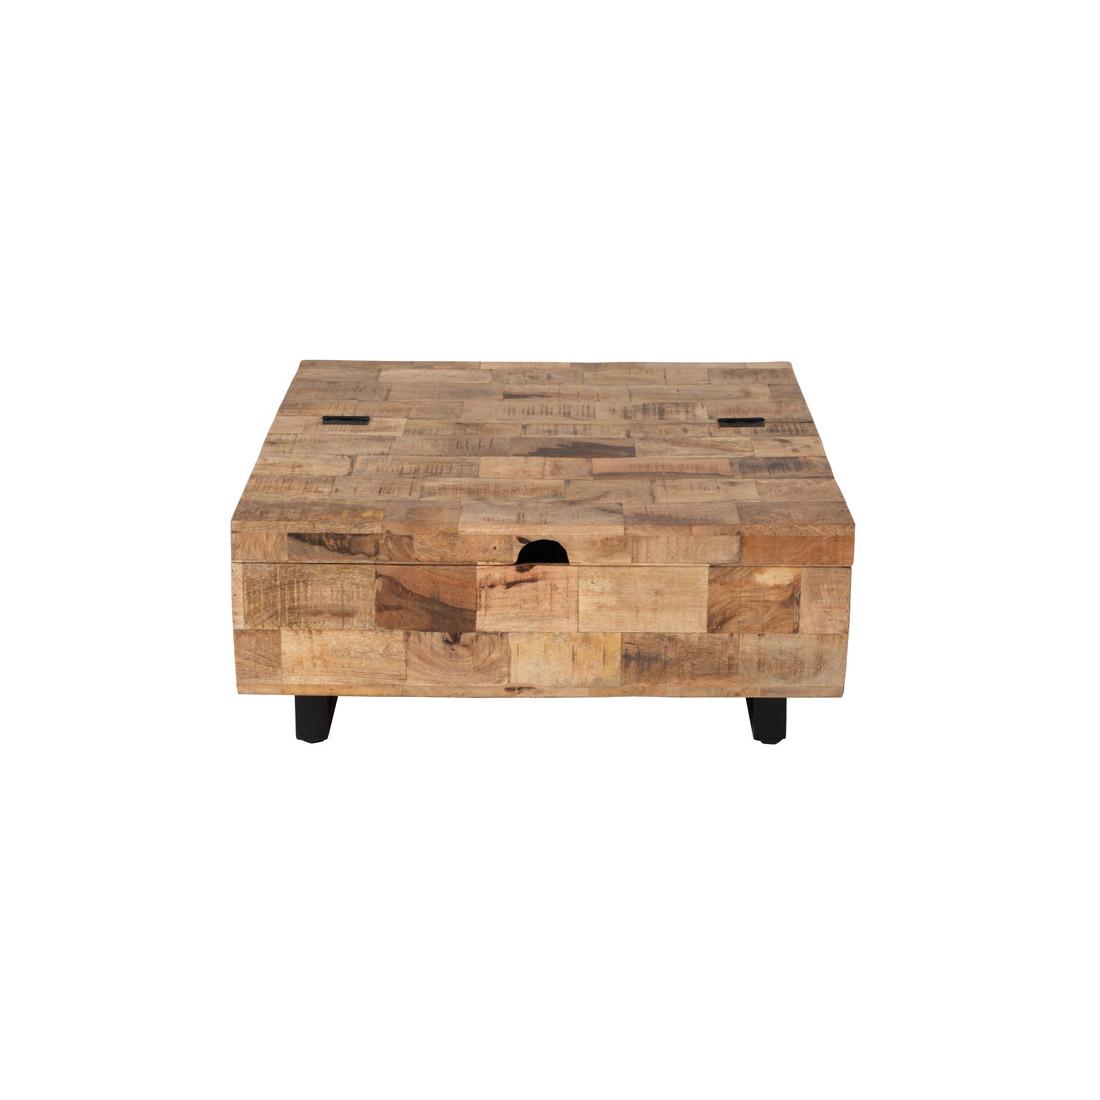 grande table basse carr e coffre en bois m tal uniona. Black Bedroom Furniture Sets. Home Design Ideas